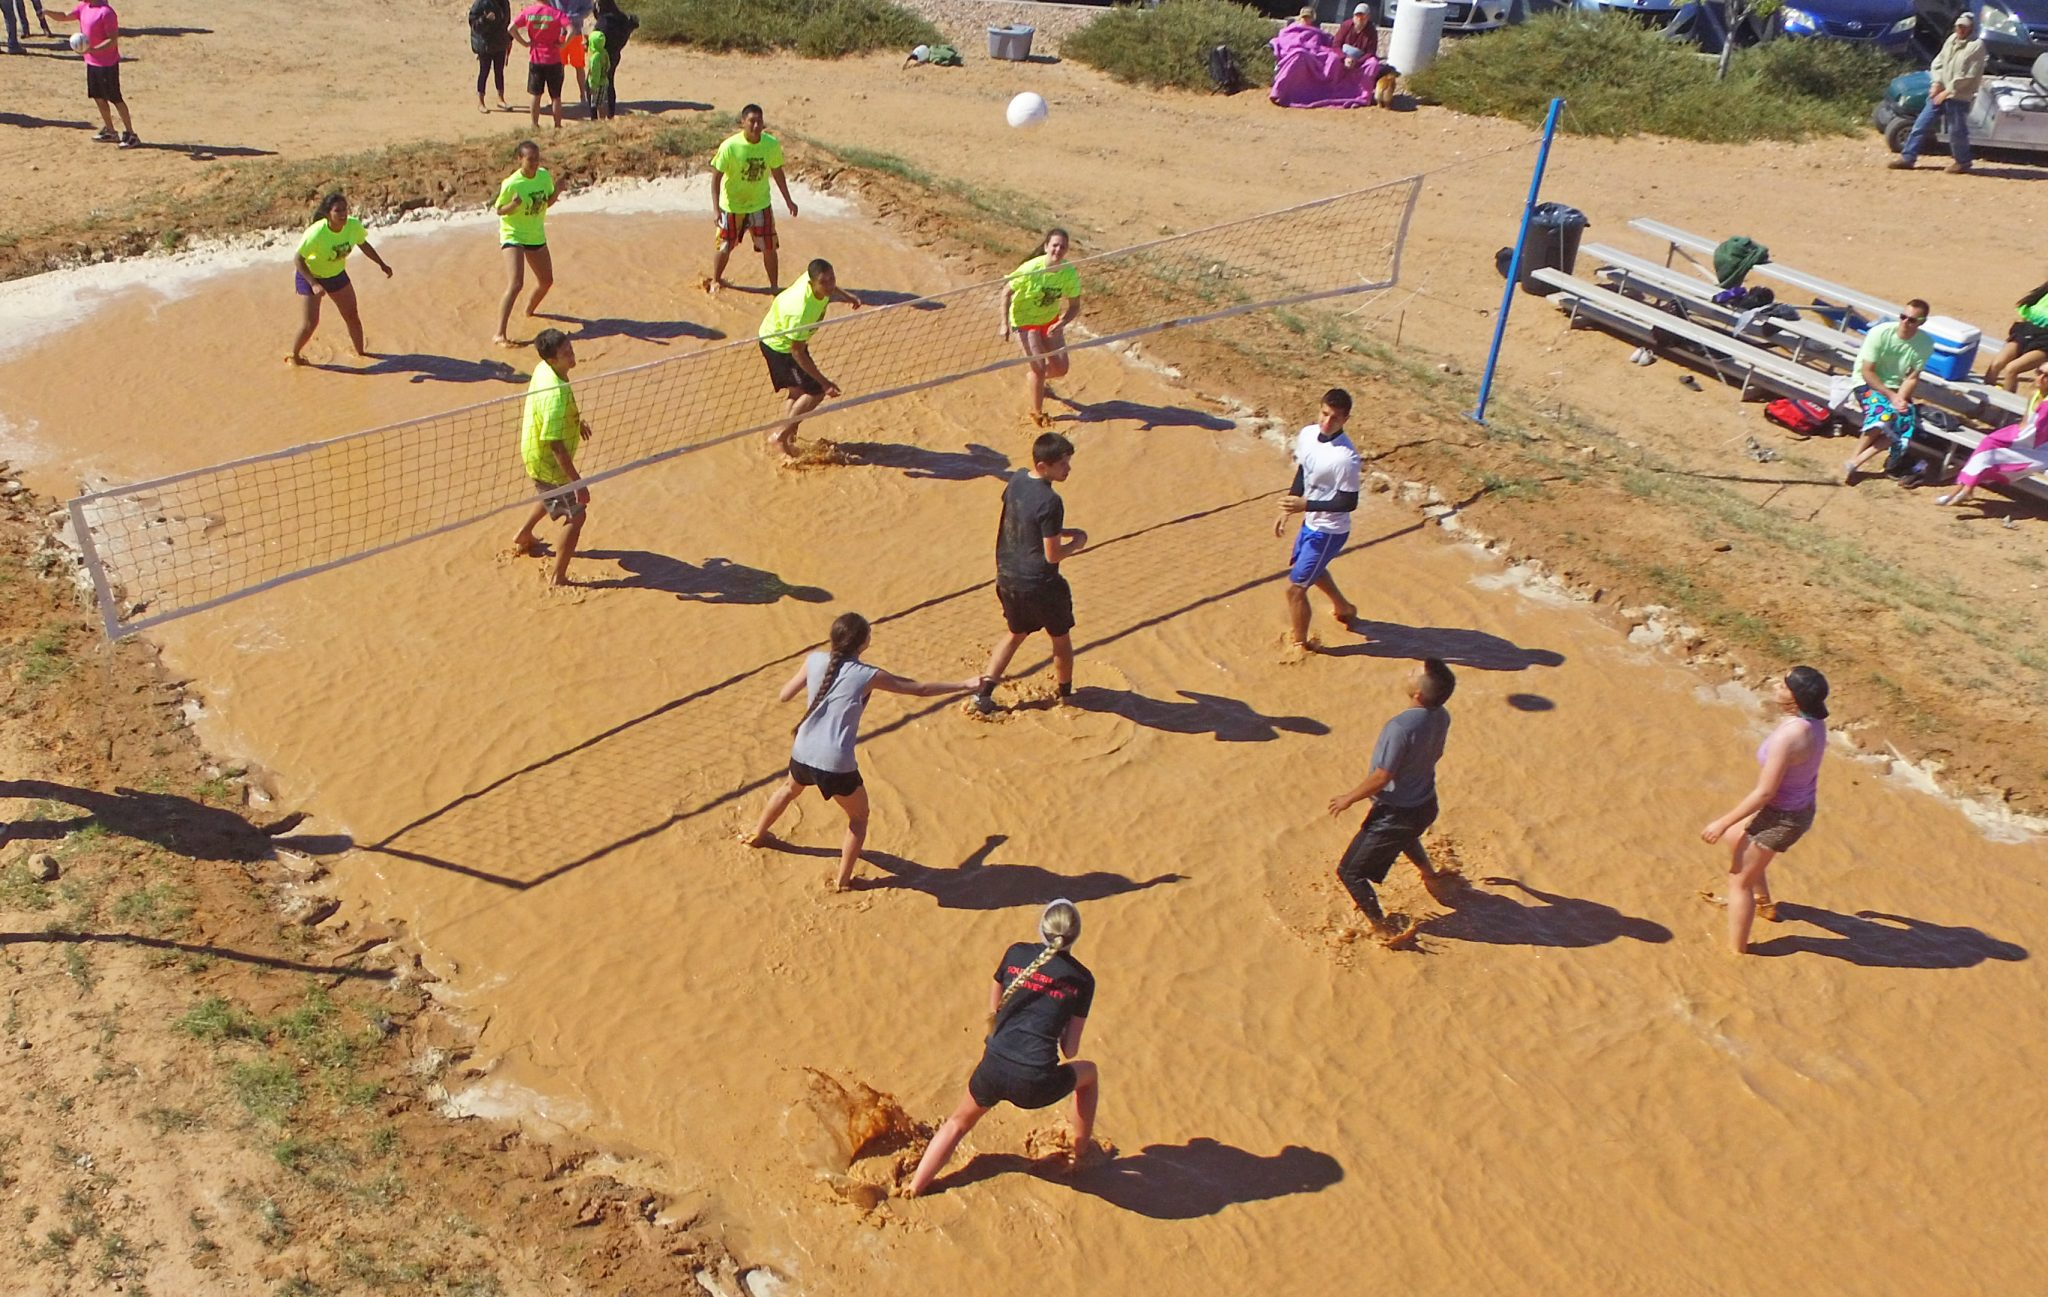 Mudd Volleyball Saturday